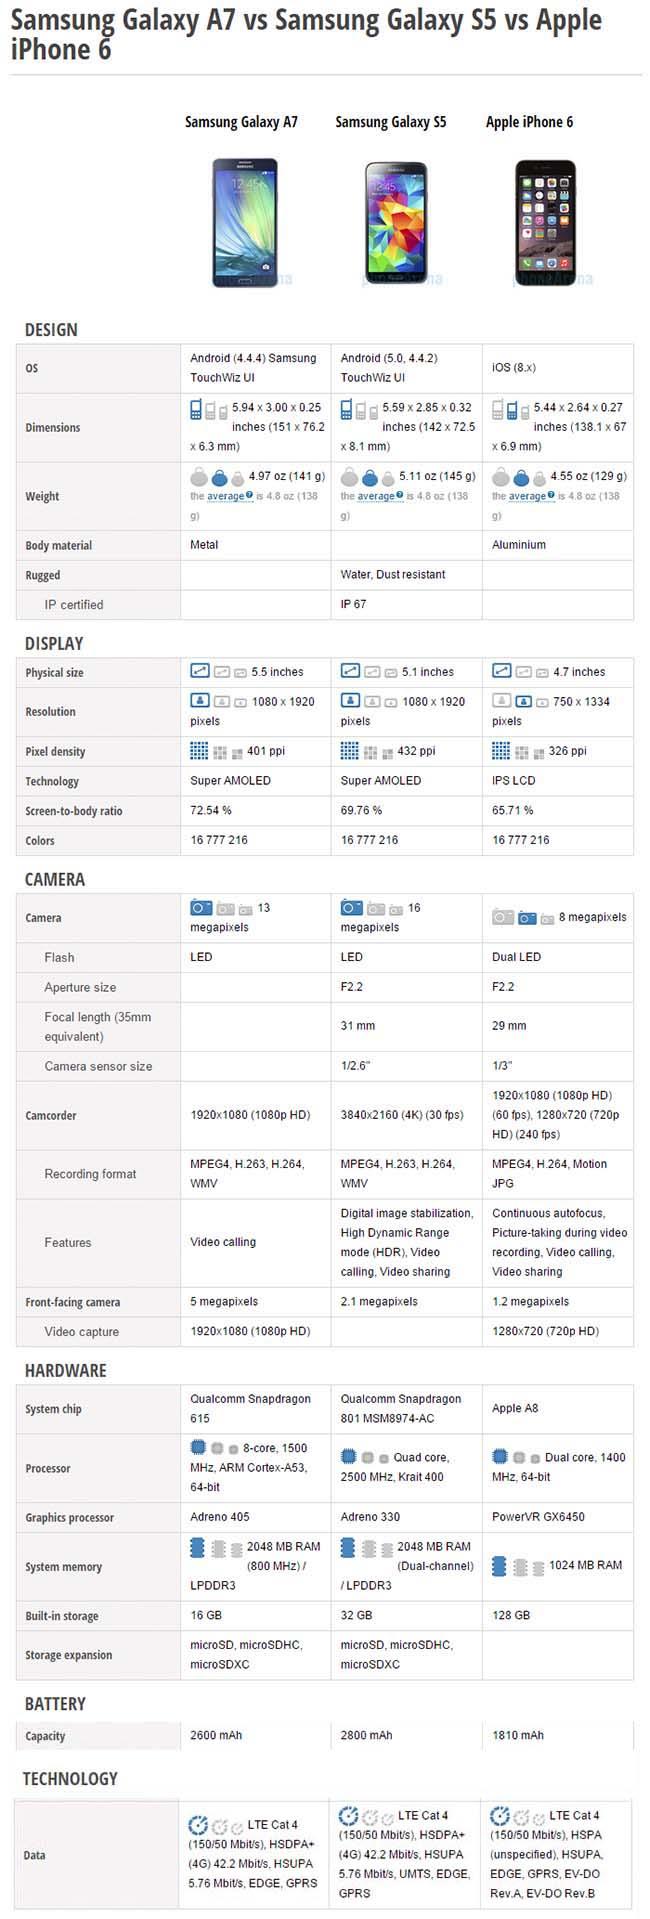 Samsung Galaxy A7 vs Galaxy S5 vs Apple iPhone 6 update